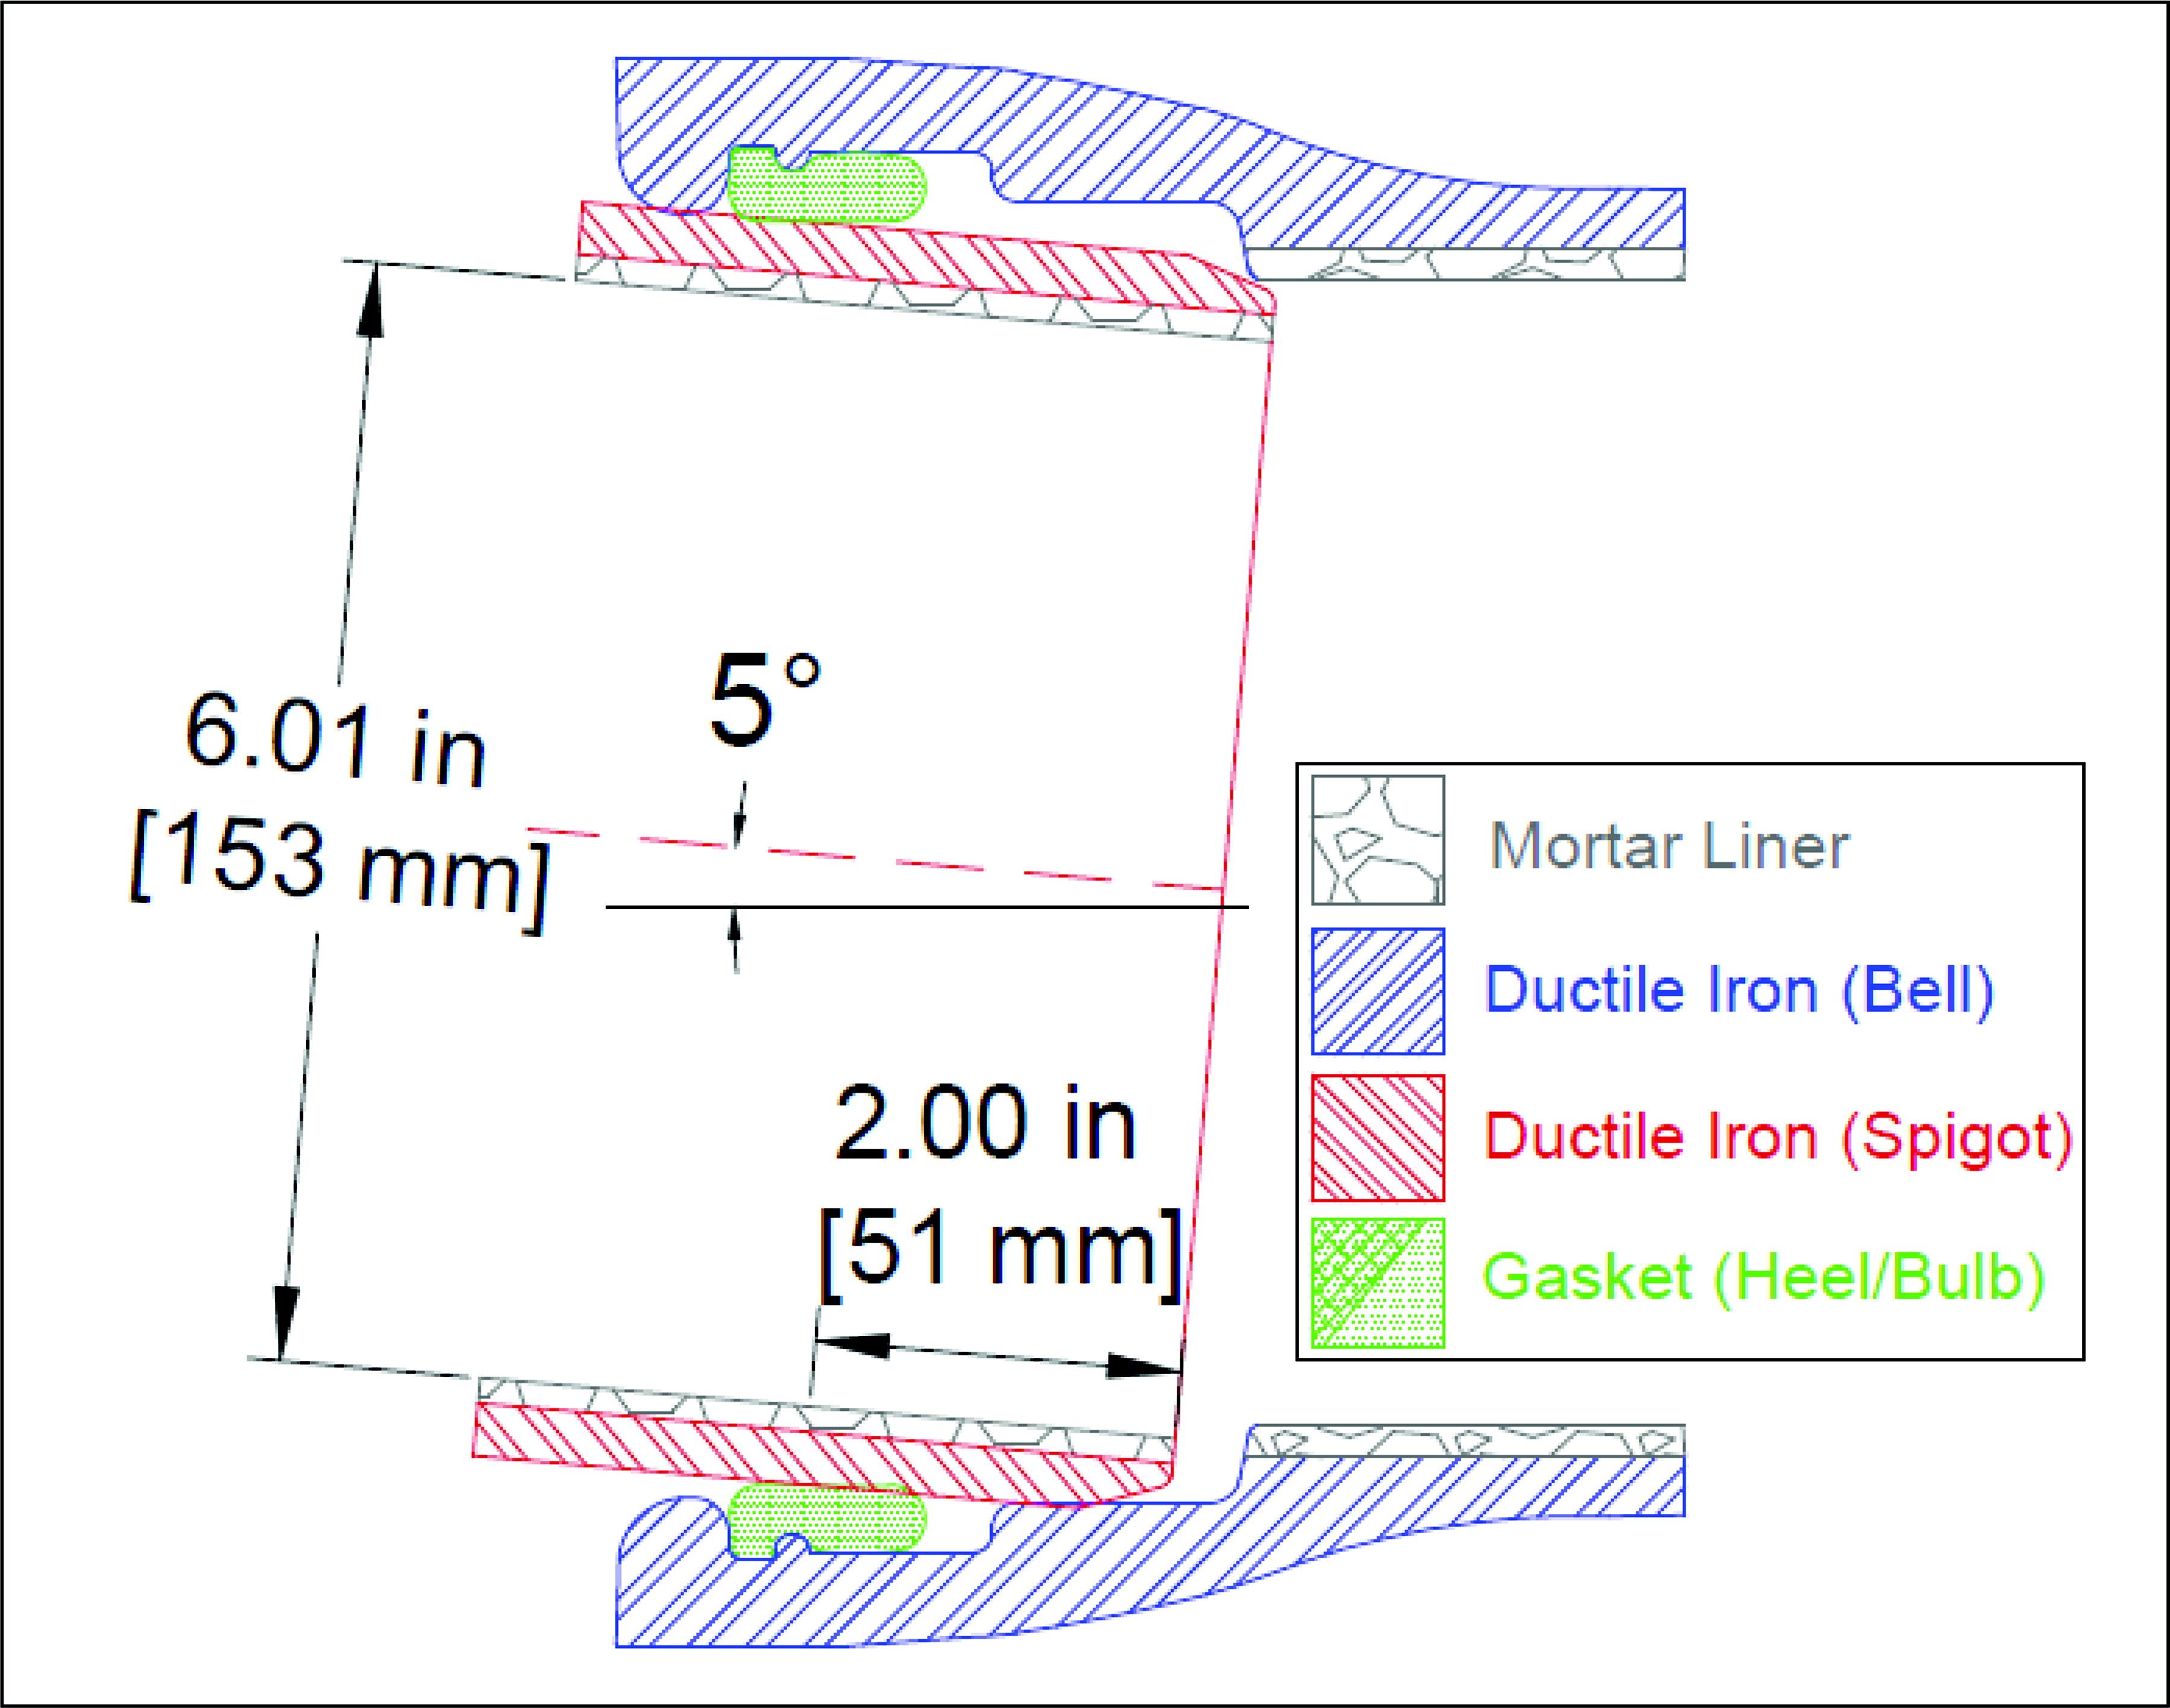 Danger fragile toit SIGNE 150 mm x 200 mm plastique rigide